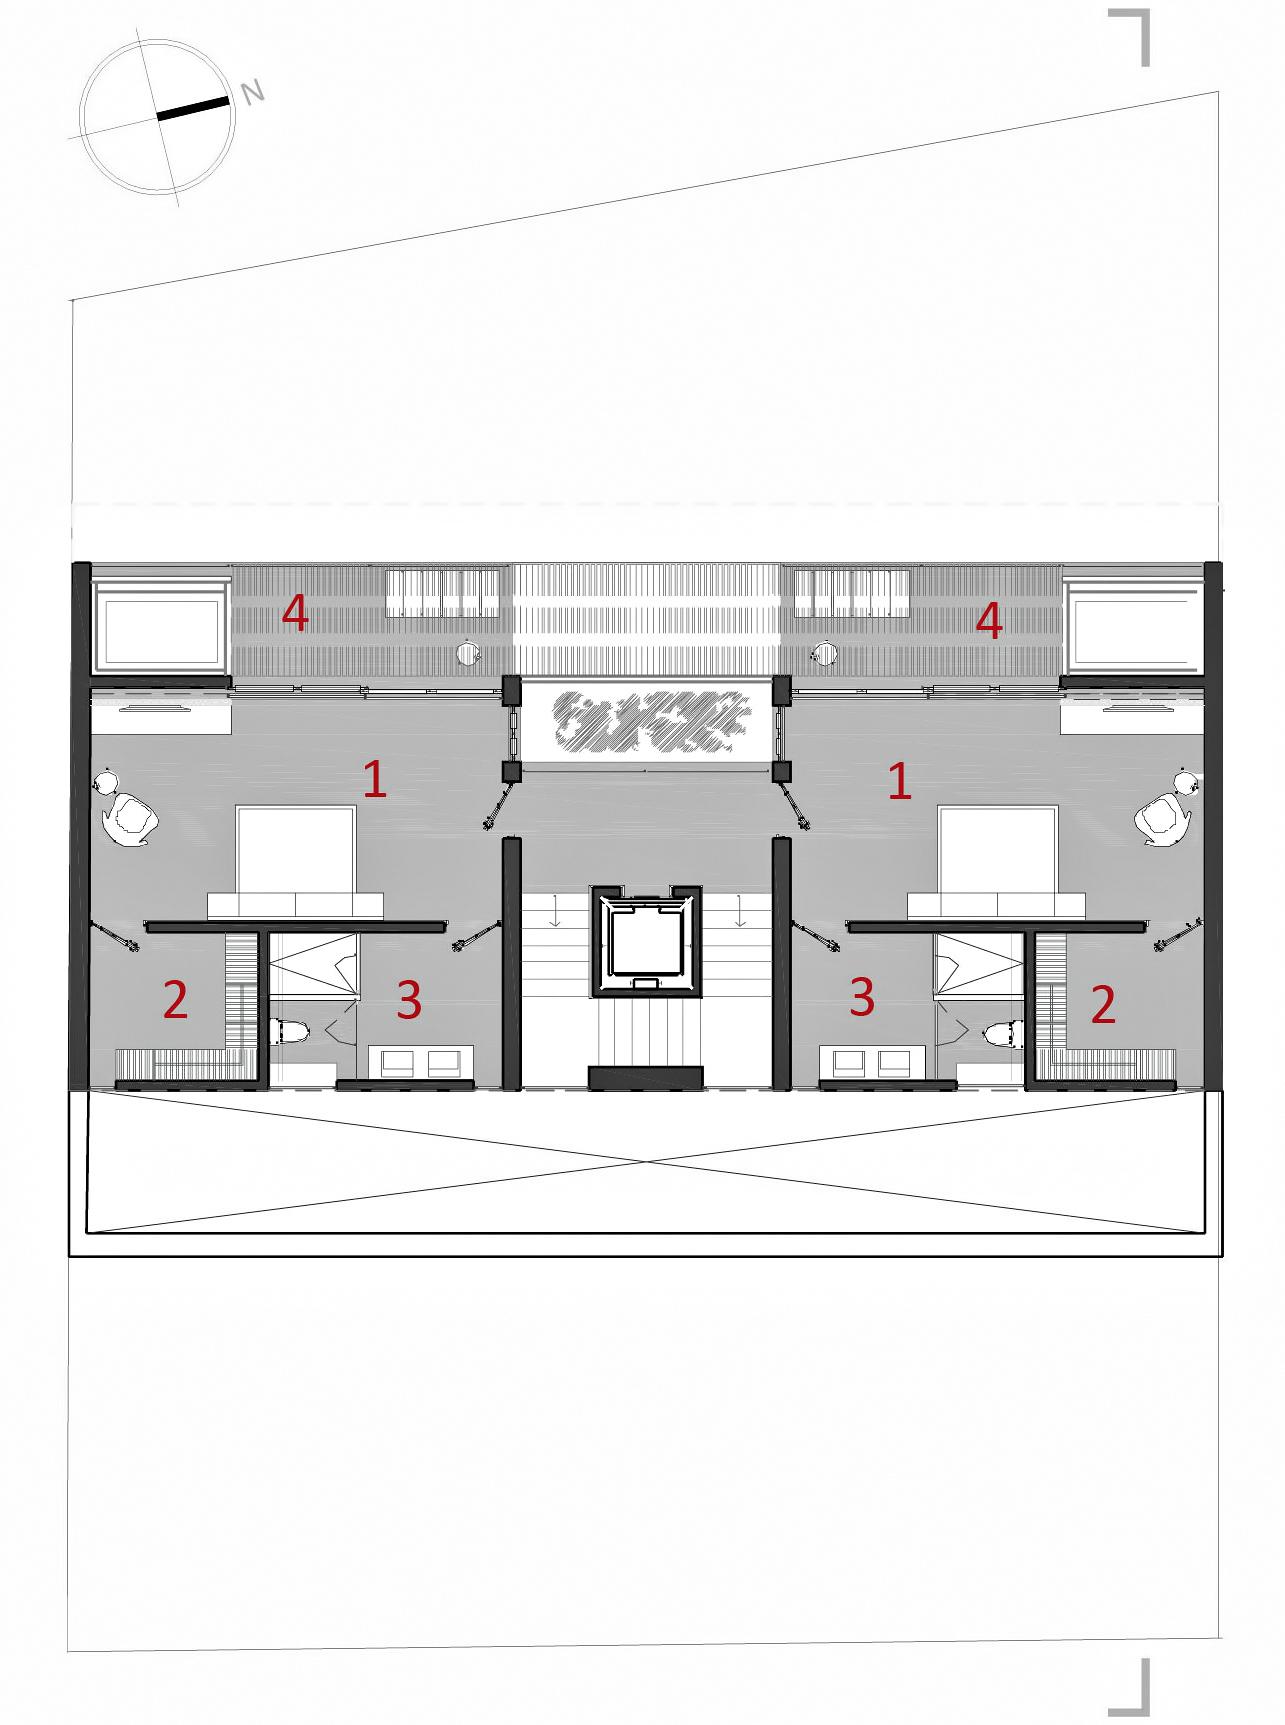 Floor Plans - Casa Almare Residence - Puerto Vallarta, Jalisco, Mexico